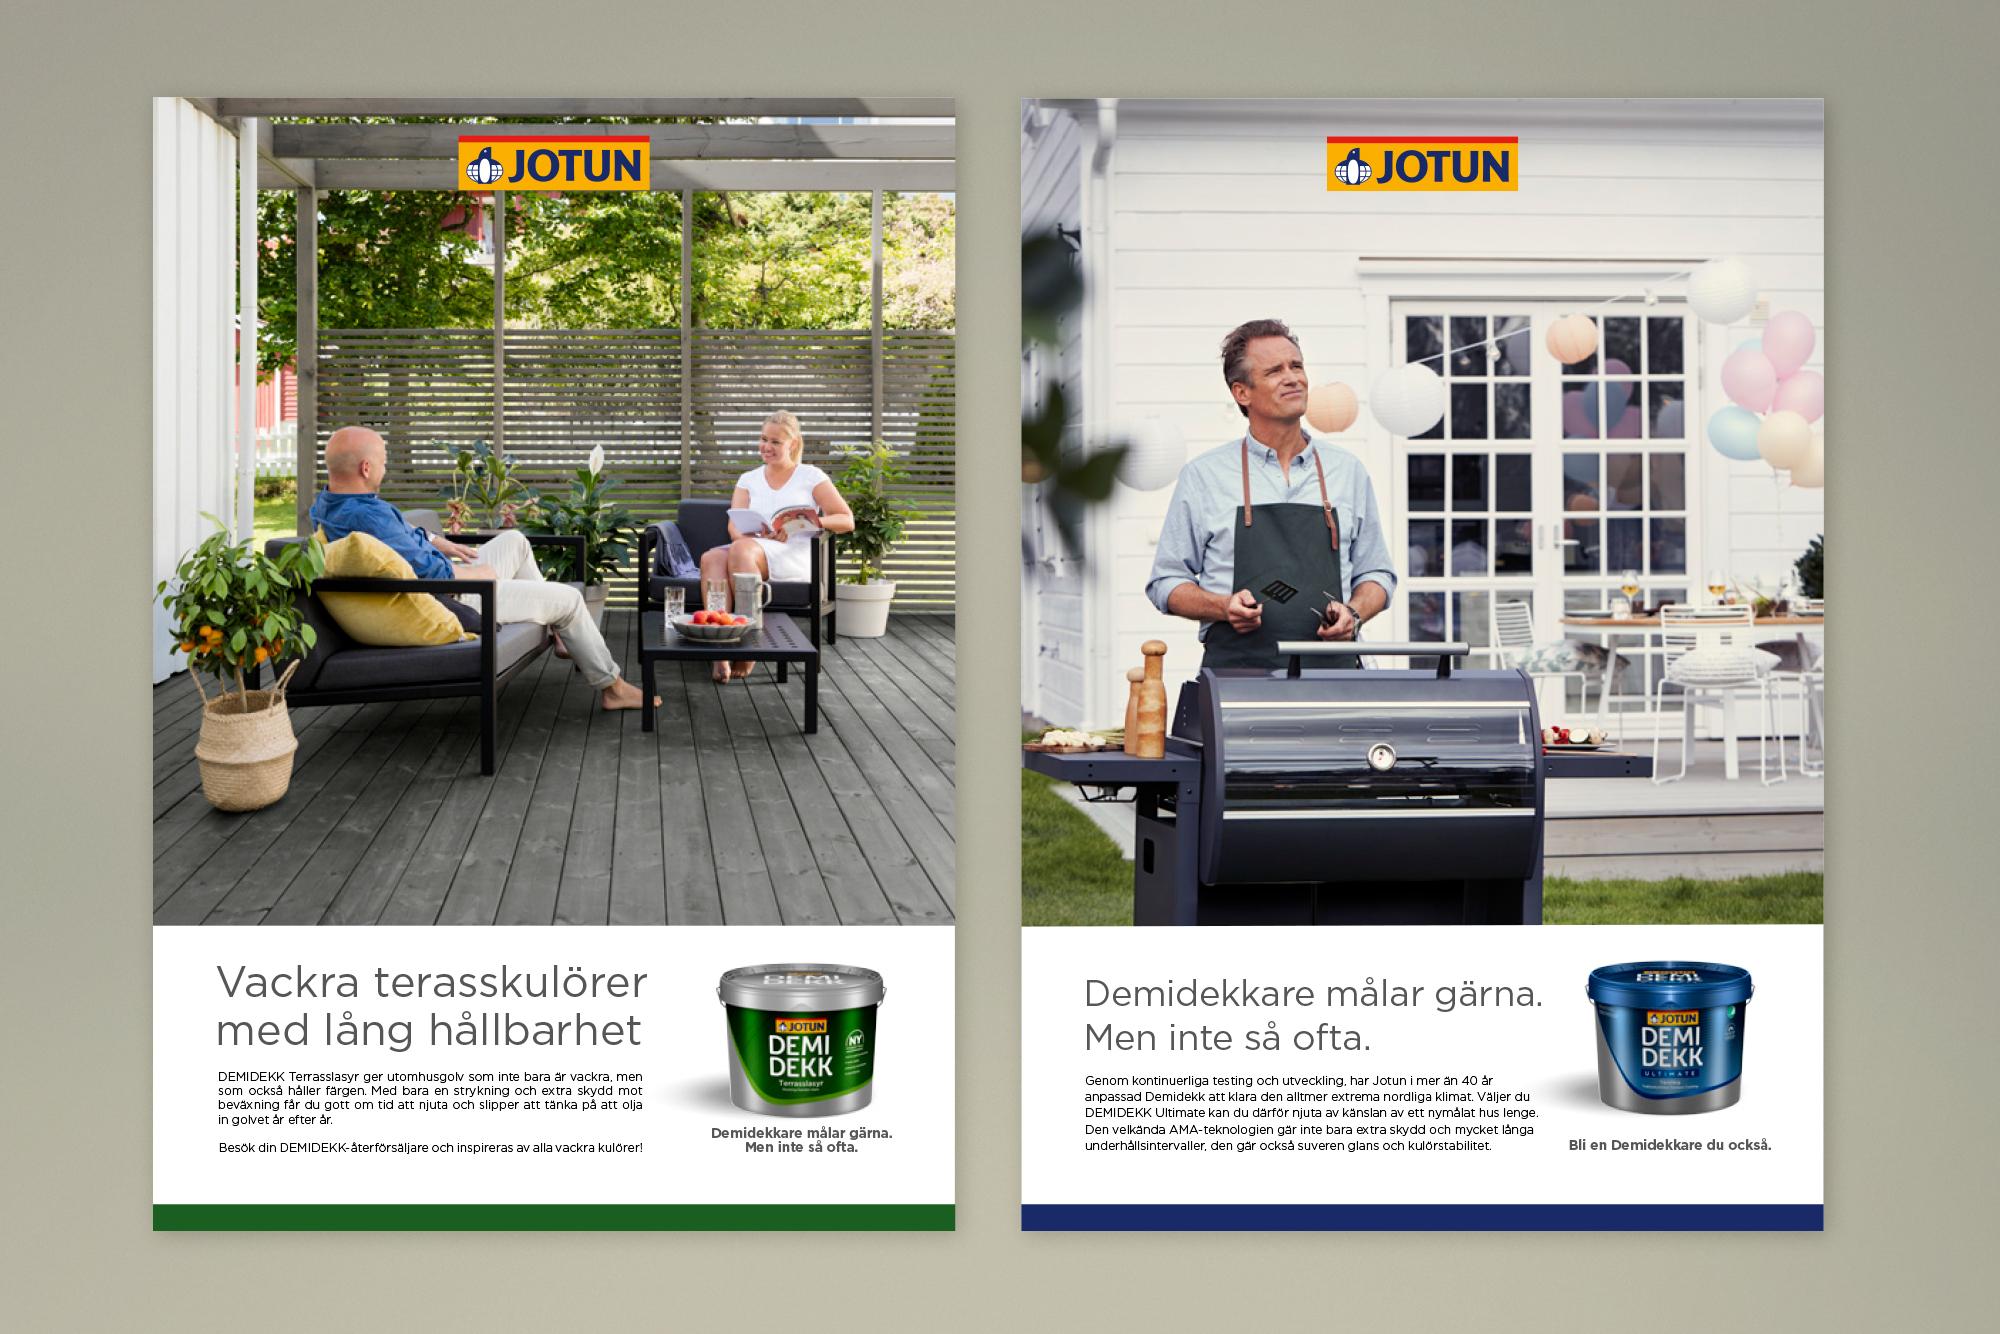 Jotun_demidekk-annonser.jpg